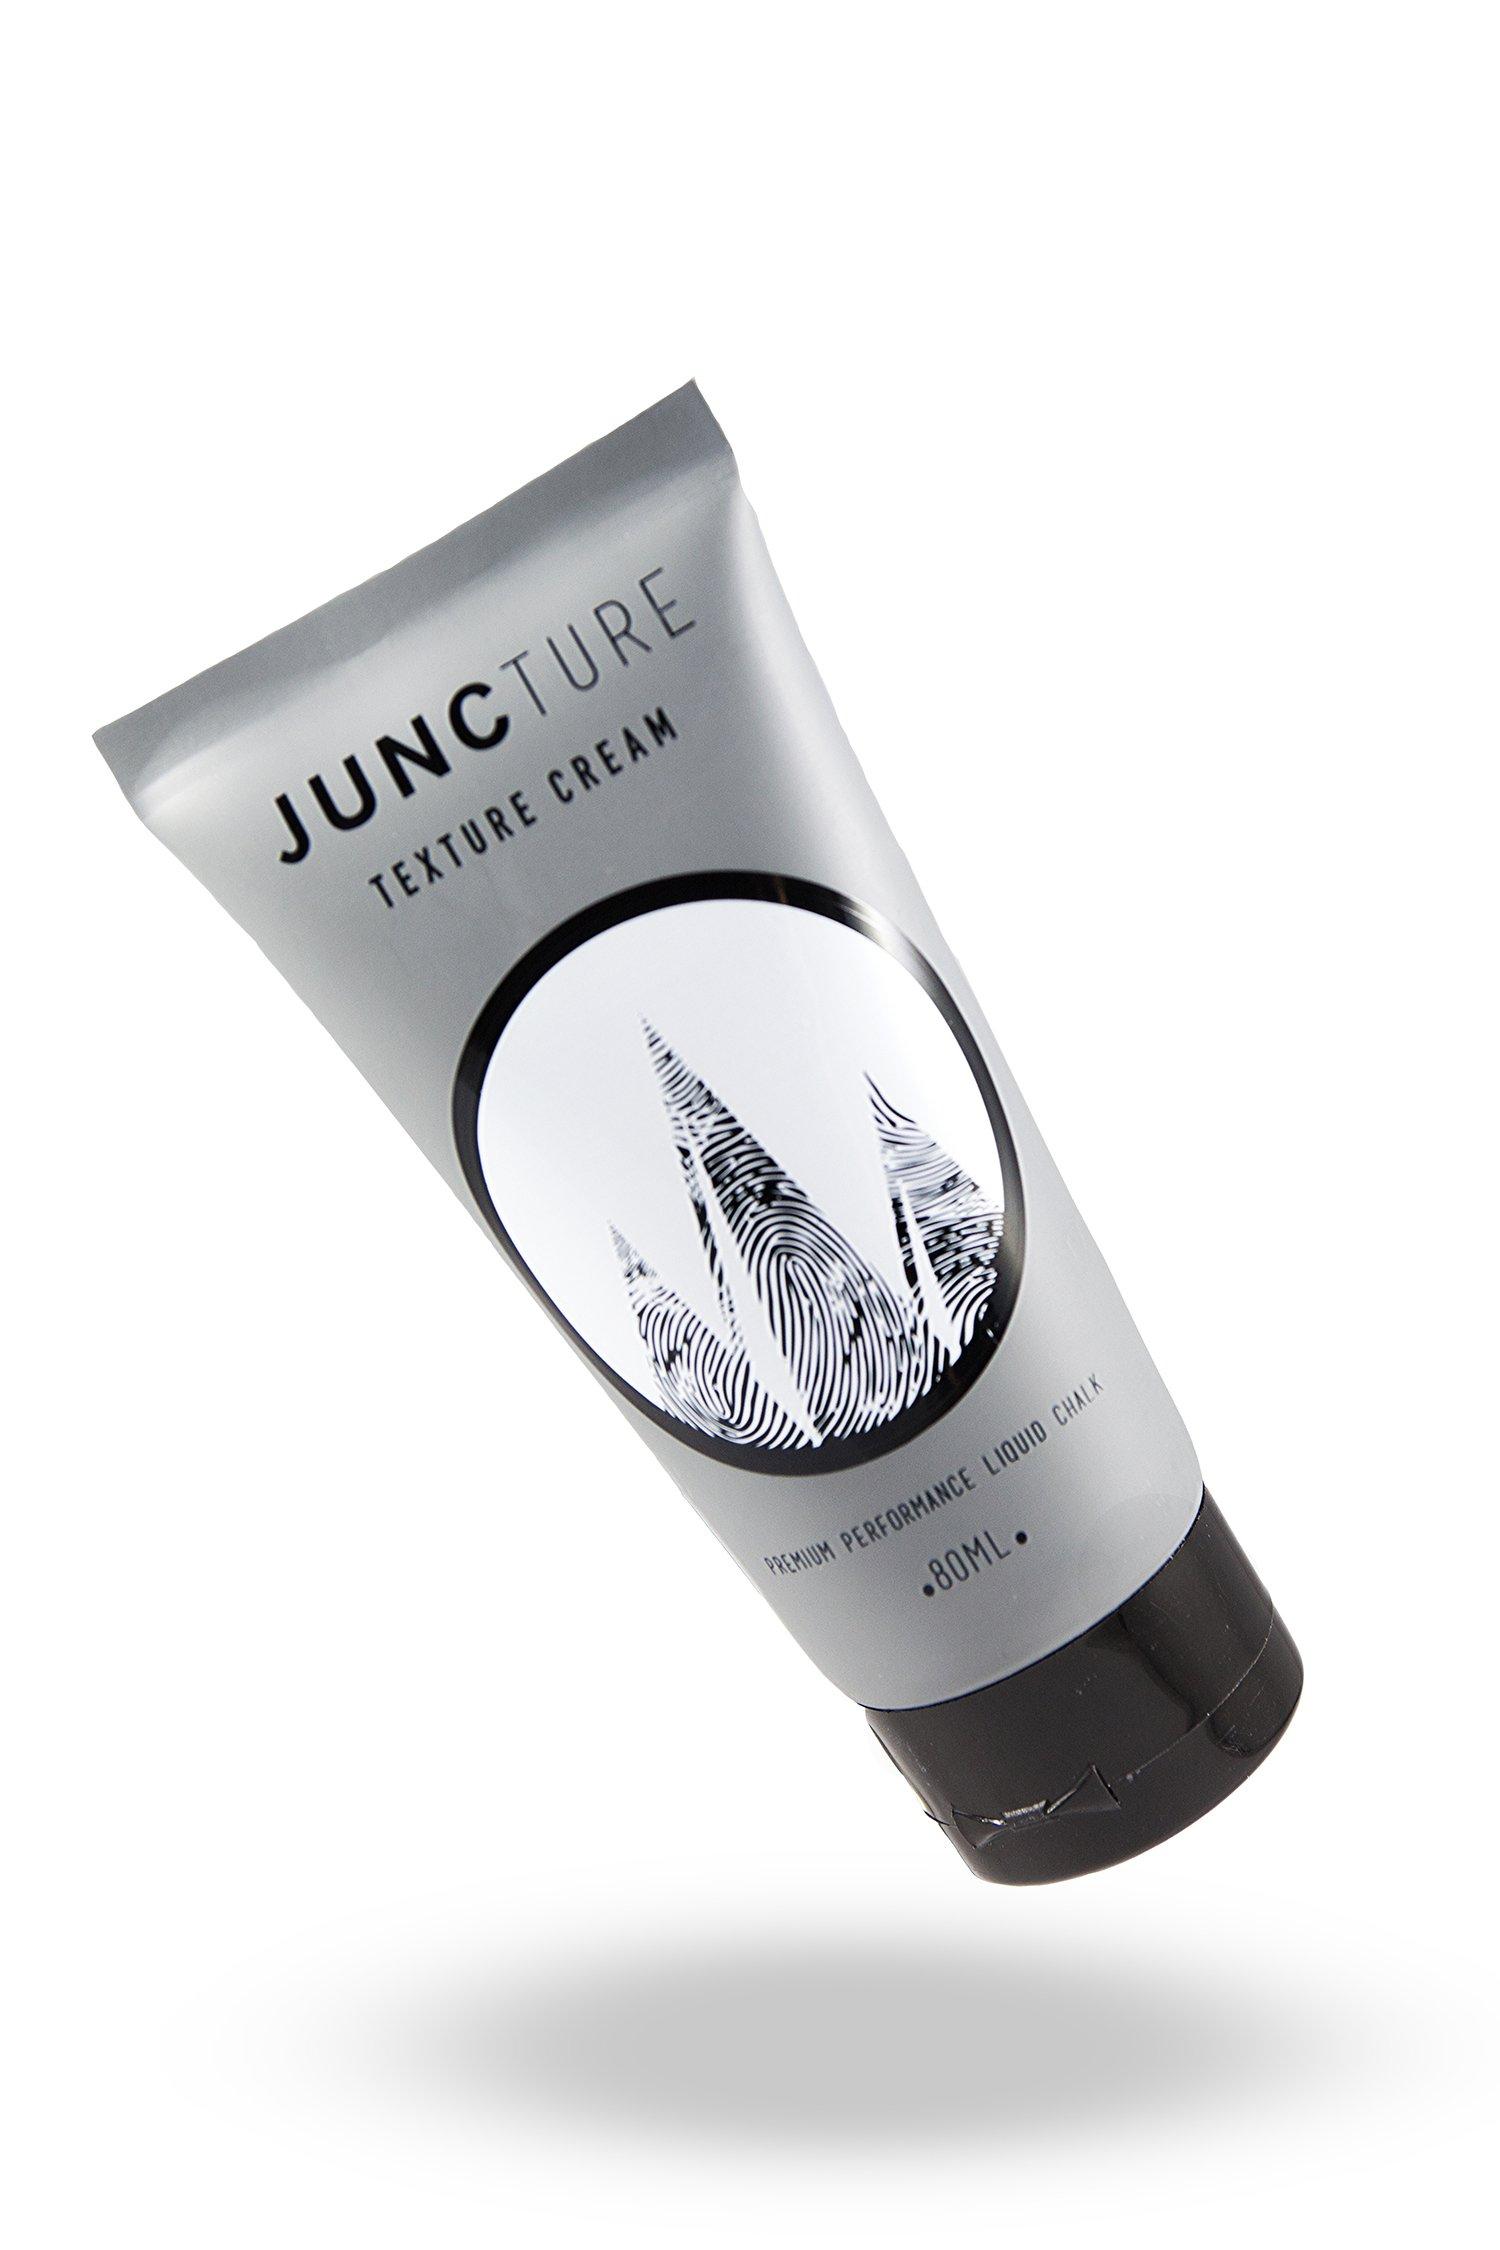 Juncture Premium Liquid Chalk Cream 80mL (Weightlifting | Powerlifting | Rock Climbing | Gymnastics & More)